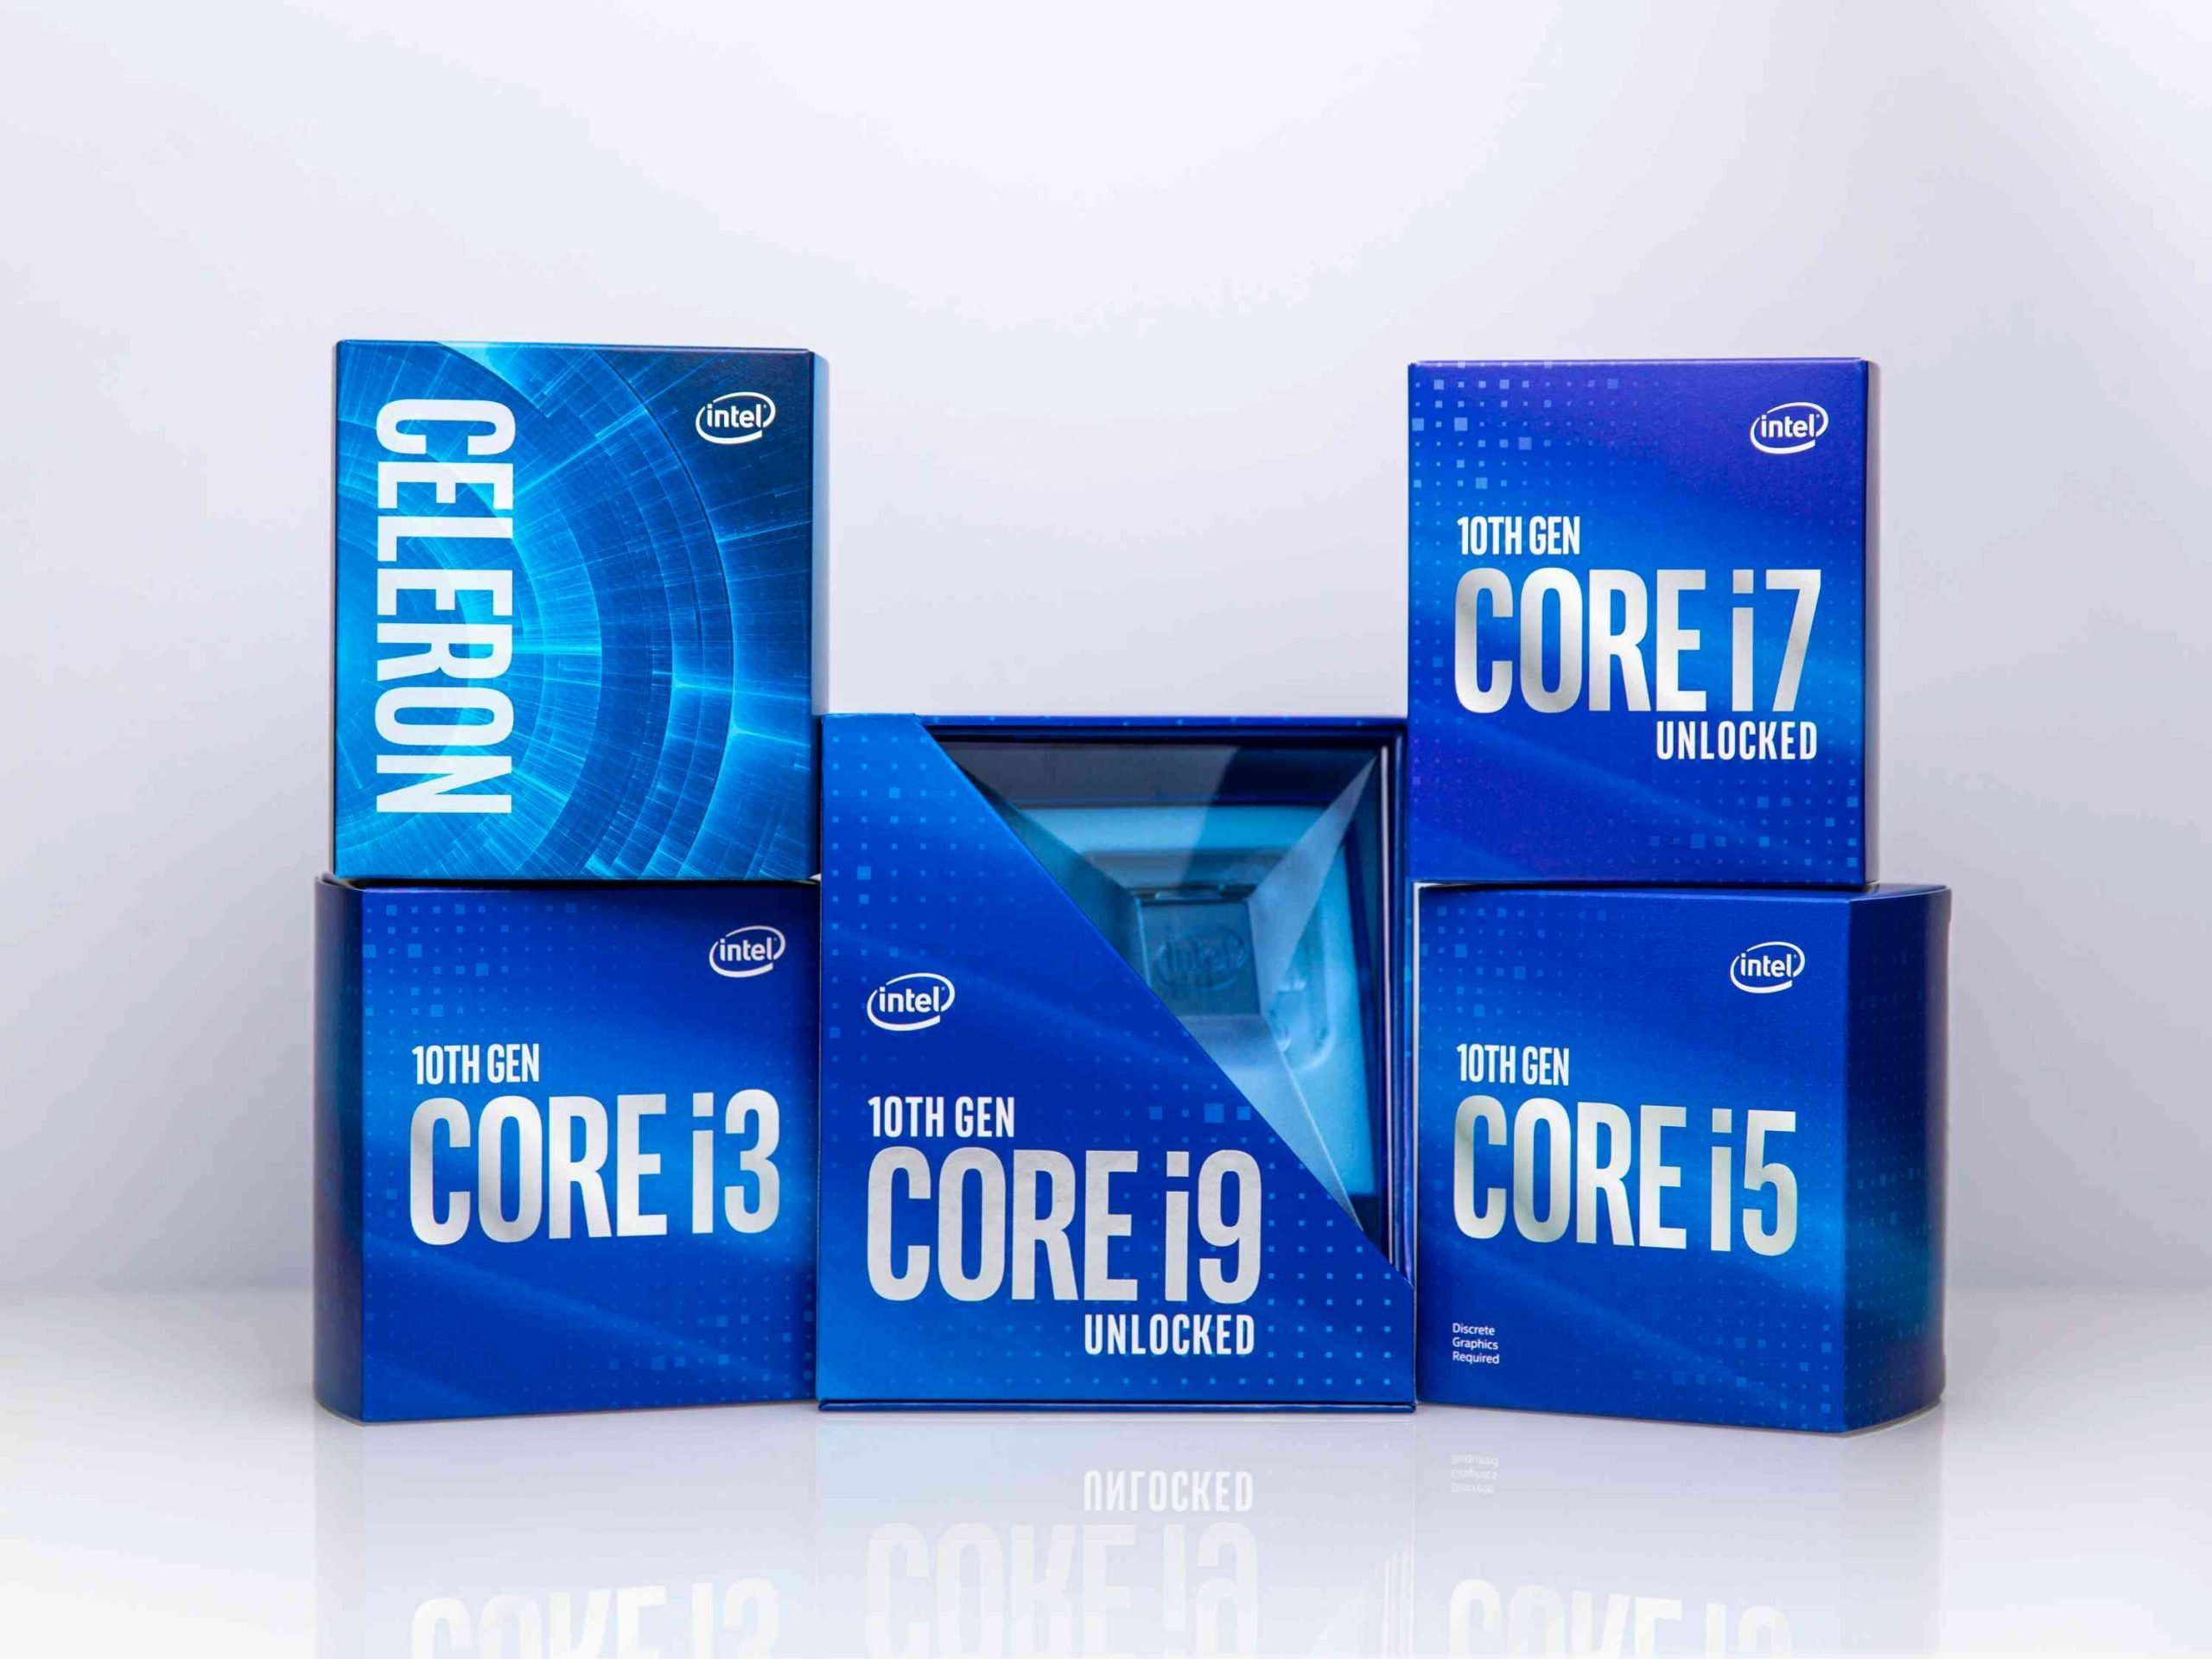 In April 2020, Intel announces new desktop processors as part of the 10th Gen Intel Core processor family. (Credit: Intel Corporation)